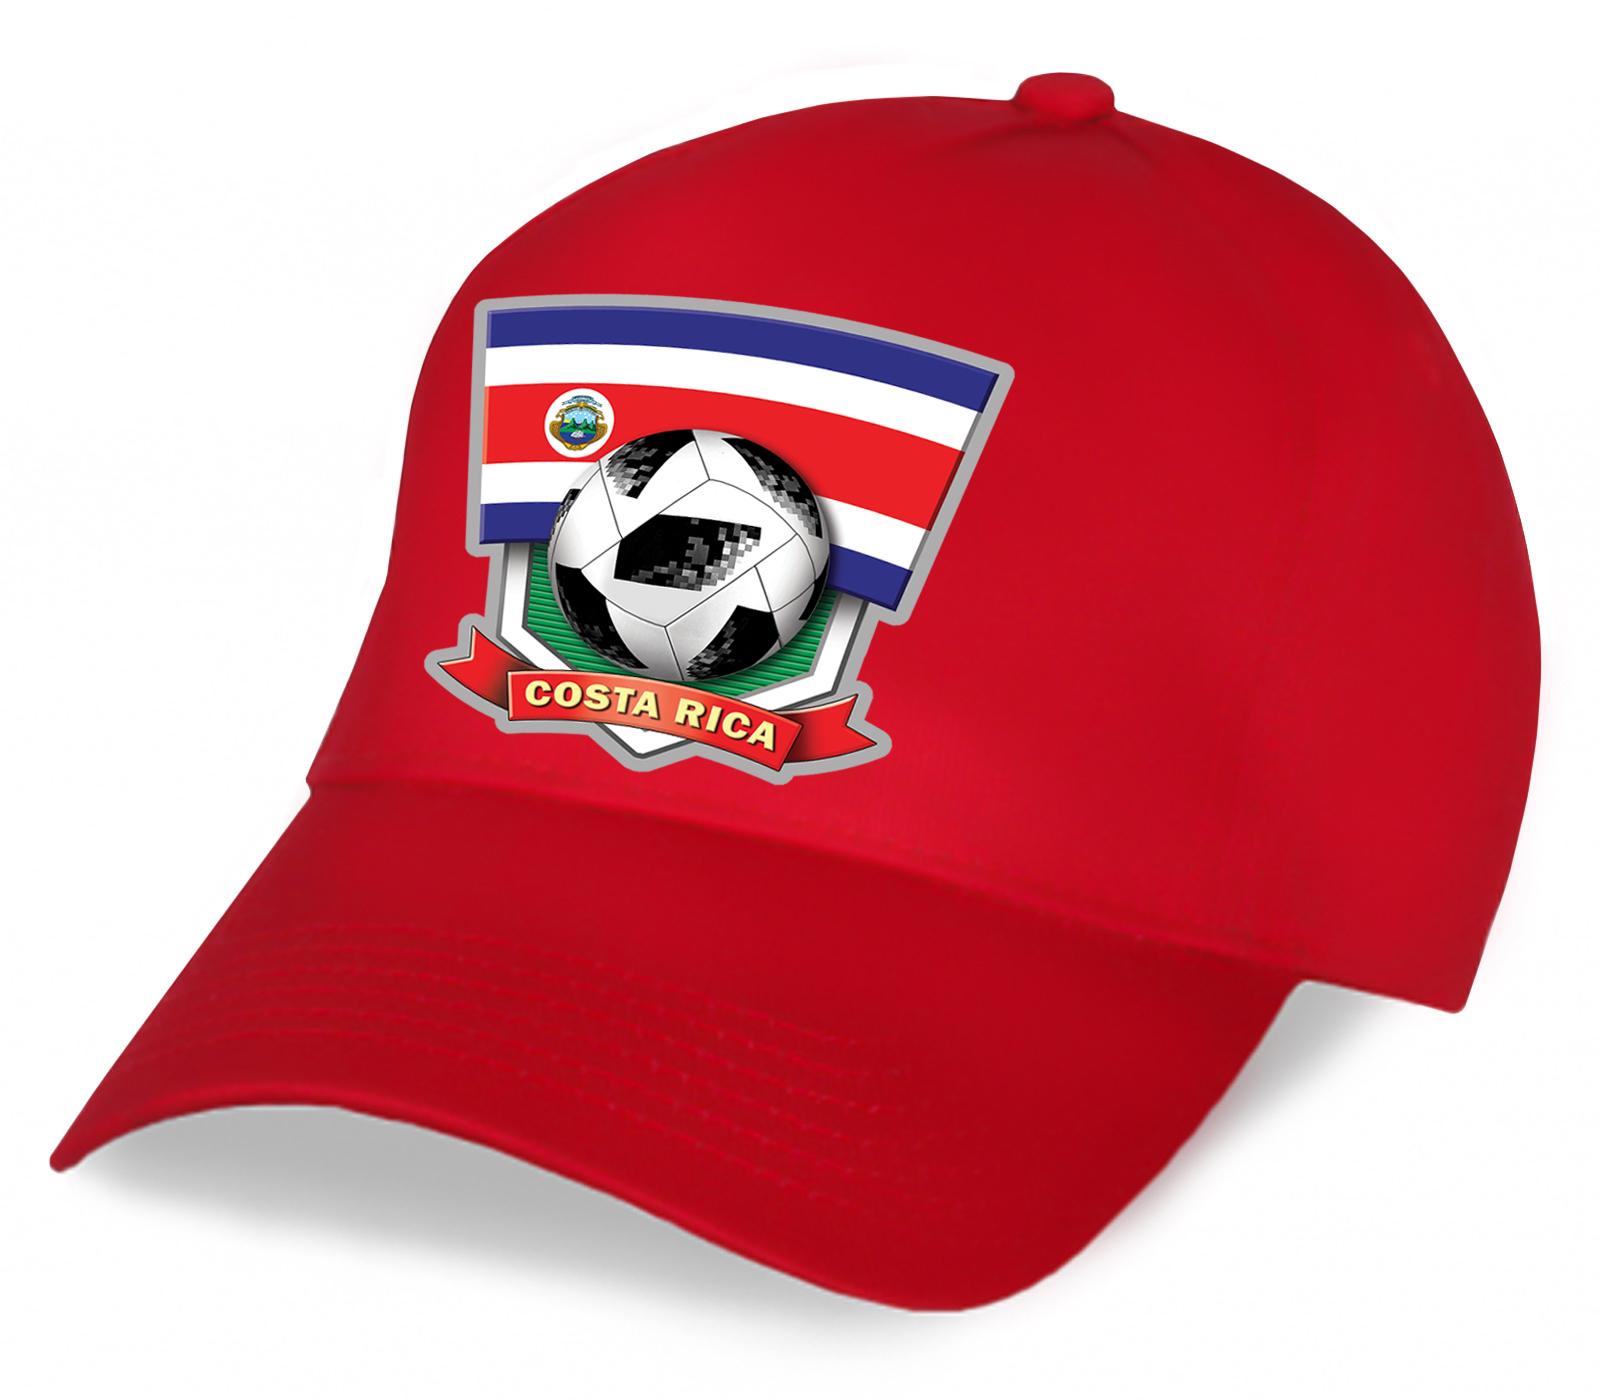 Бейсболка с символикой Коста-Рики